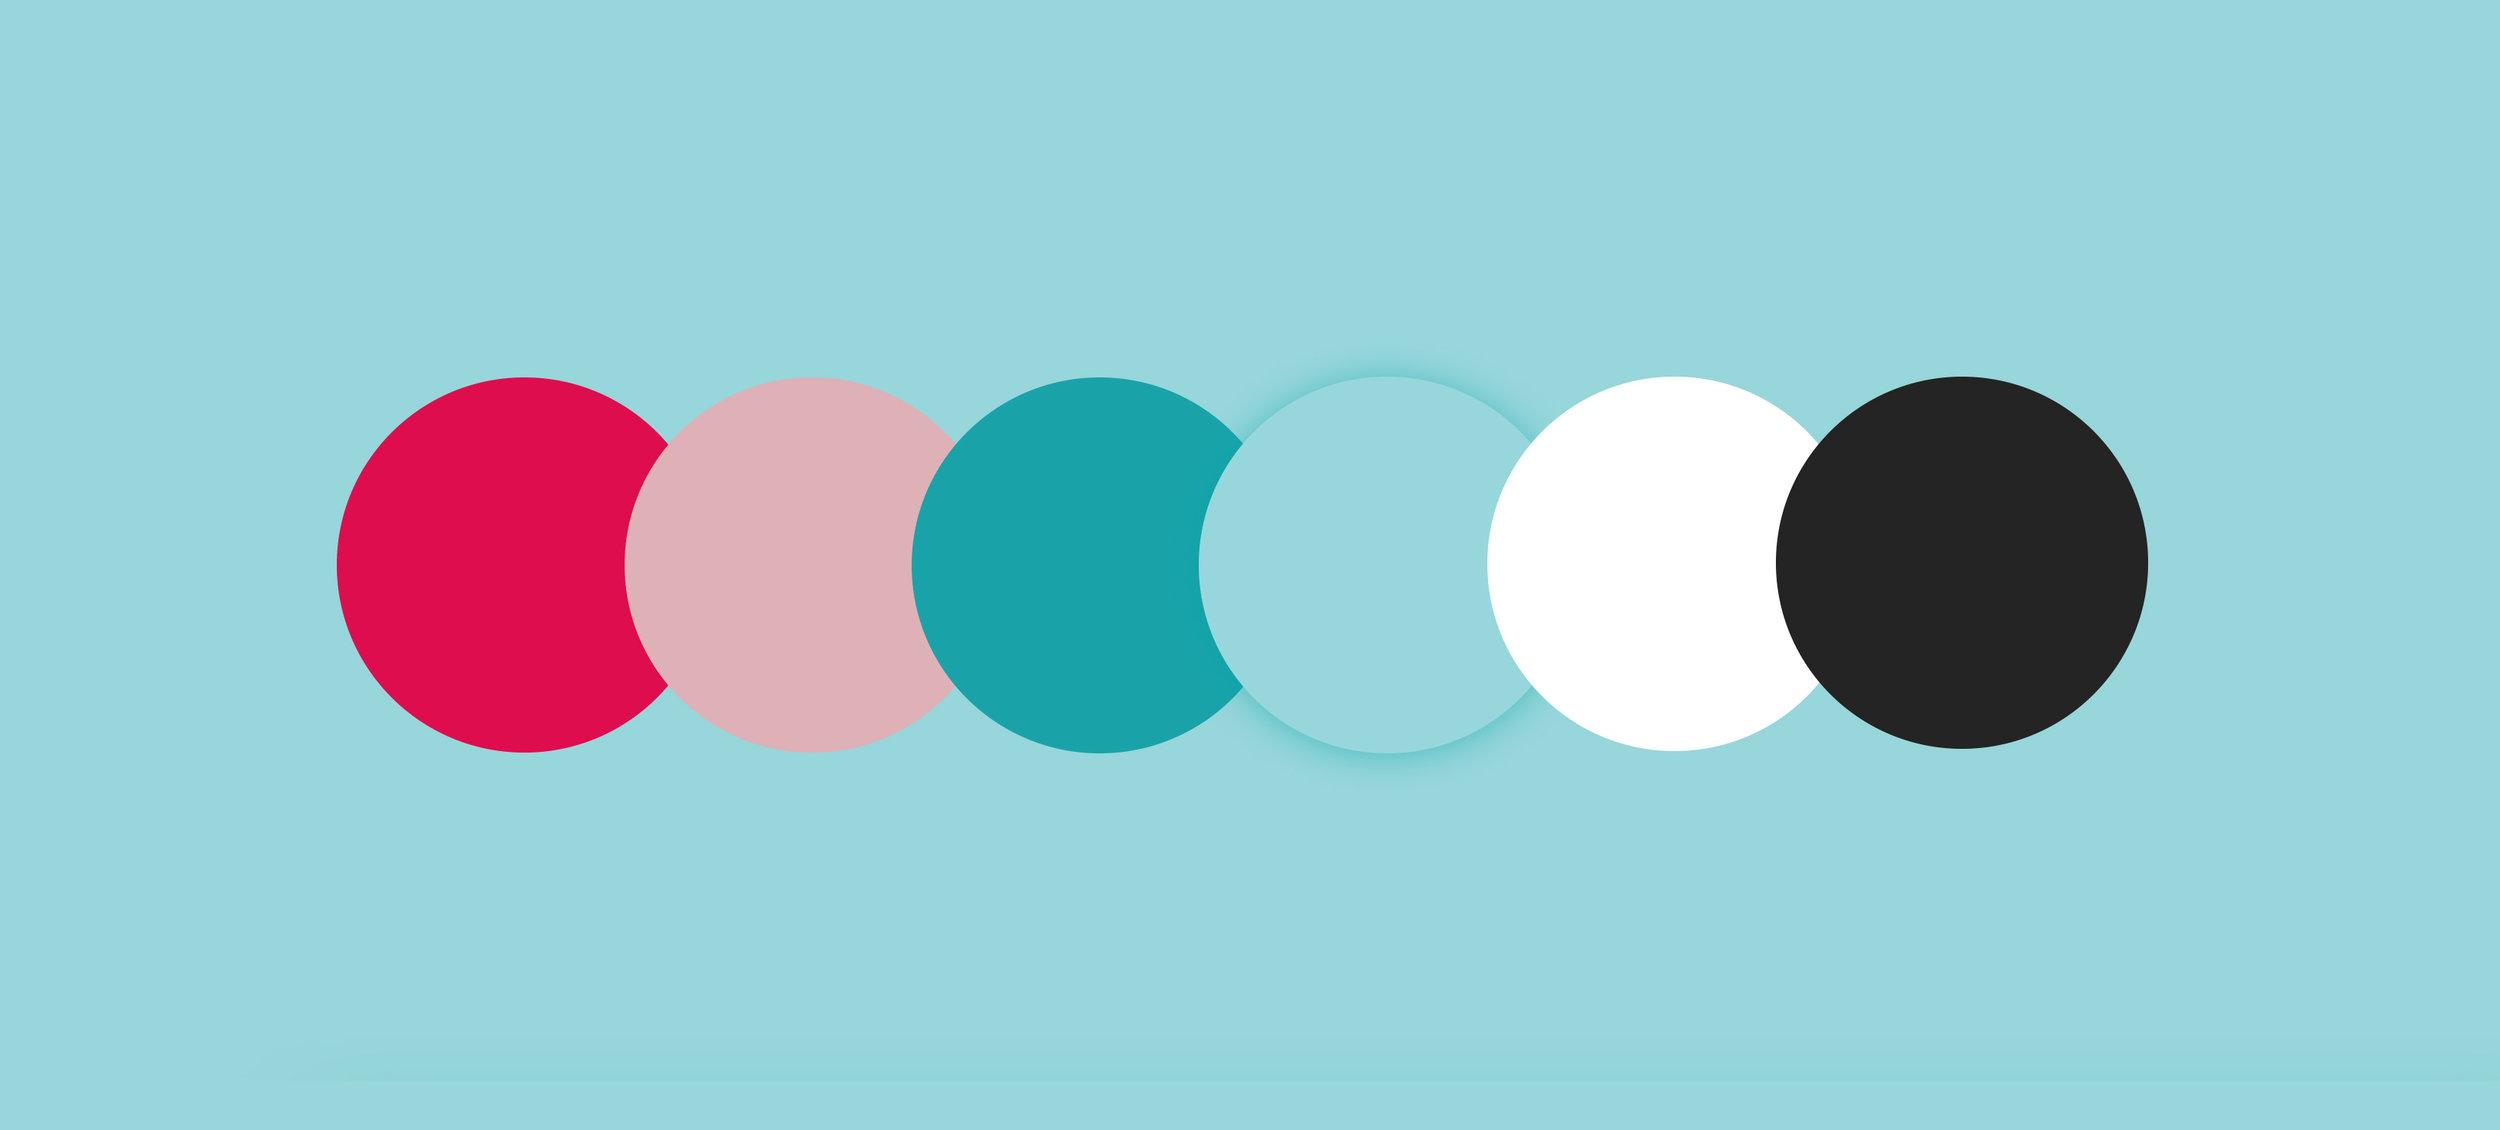 frifond-behance-farger.jpg